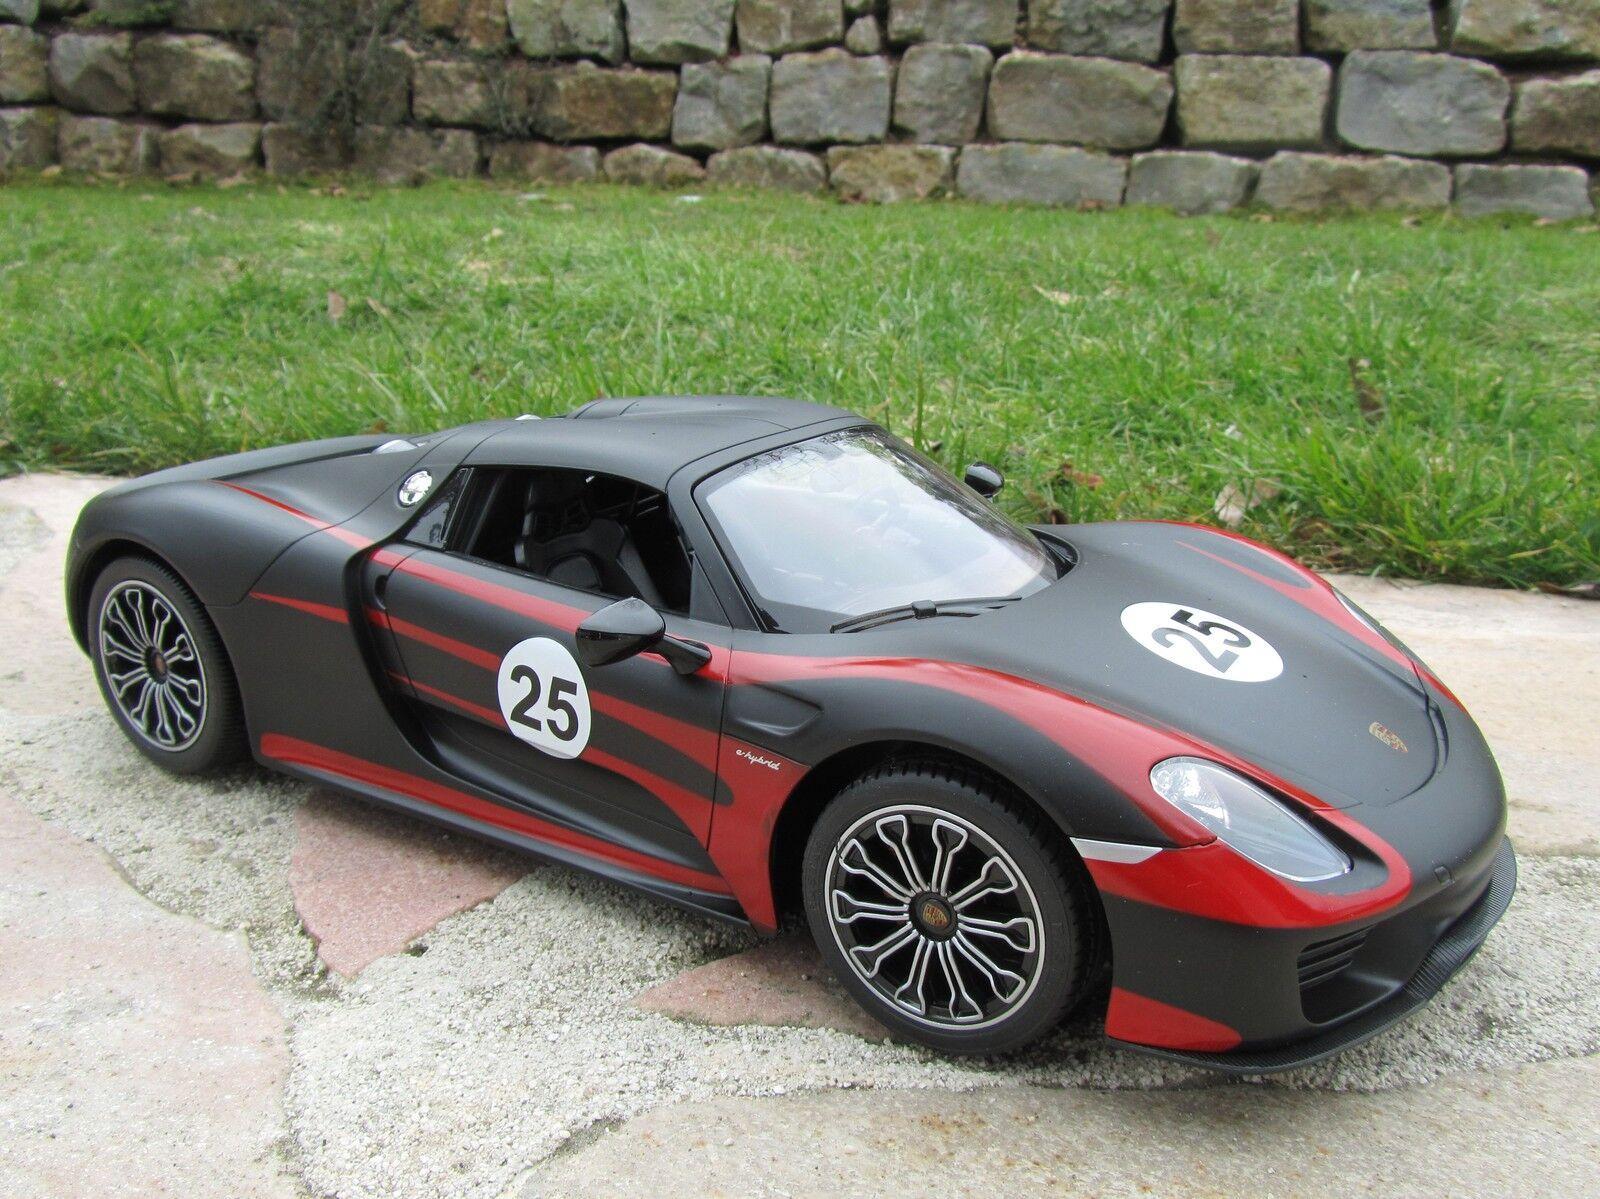 RC Porsche 918 Spyder Race 27Mhz Lizenz Modell 34cm 1 14  Top Qualität  404581